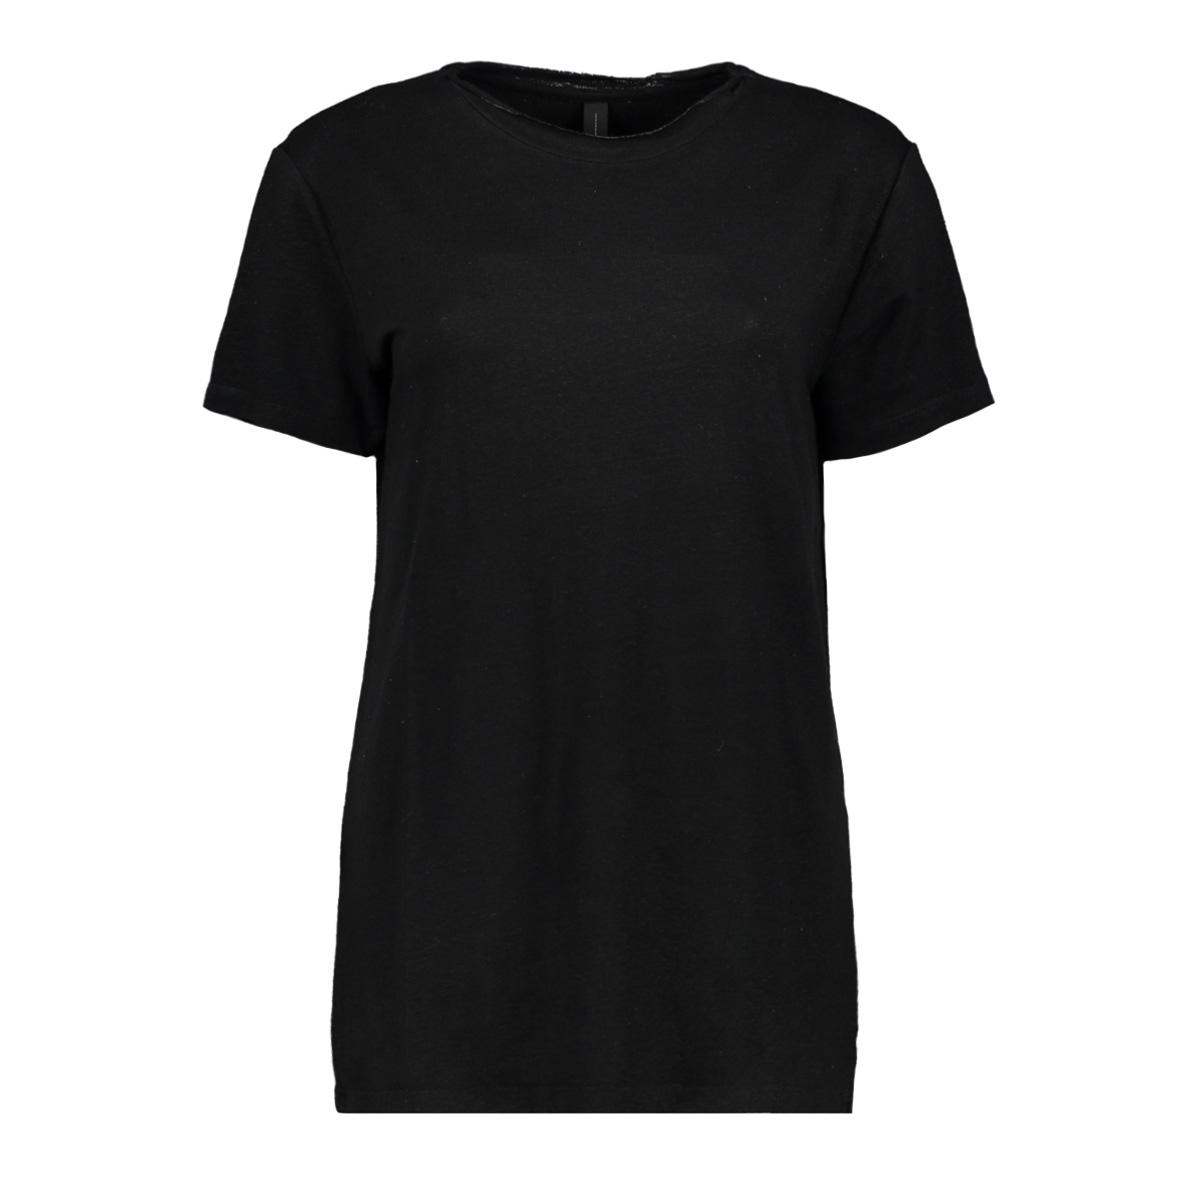 the shortsleeve 21 745 9900 10 days t-shirt black